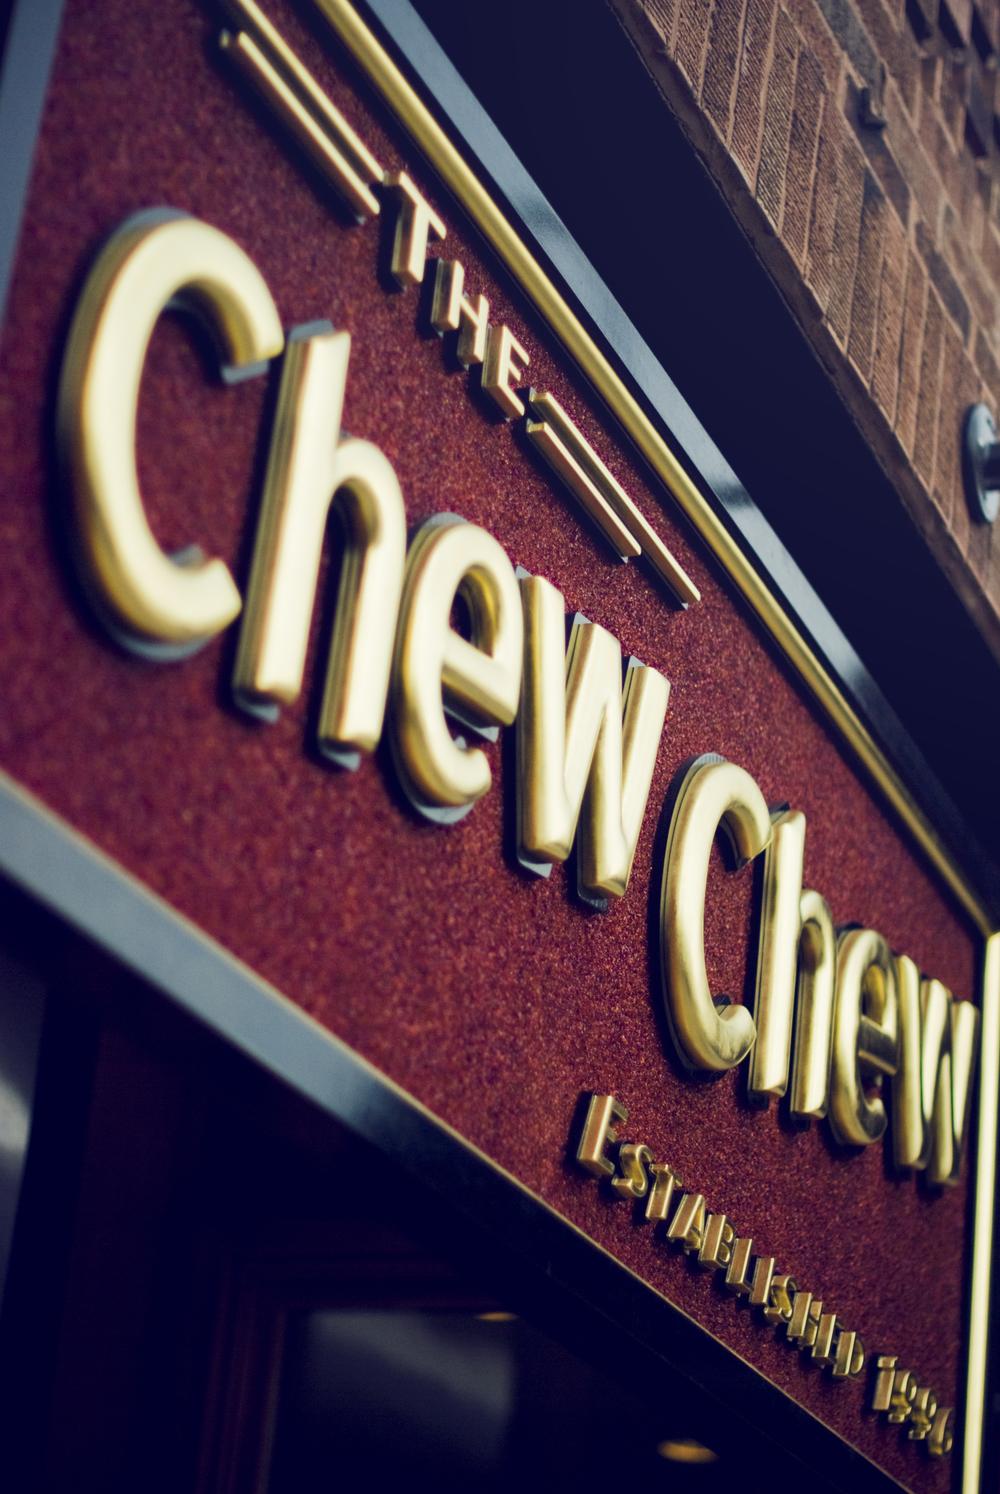 17_Chew_Chew.jpg